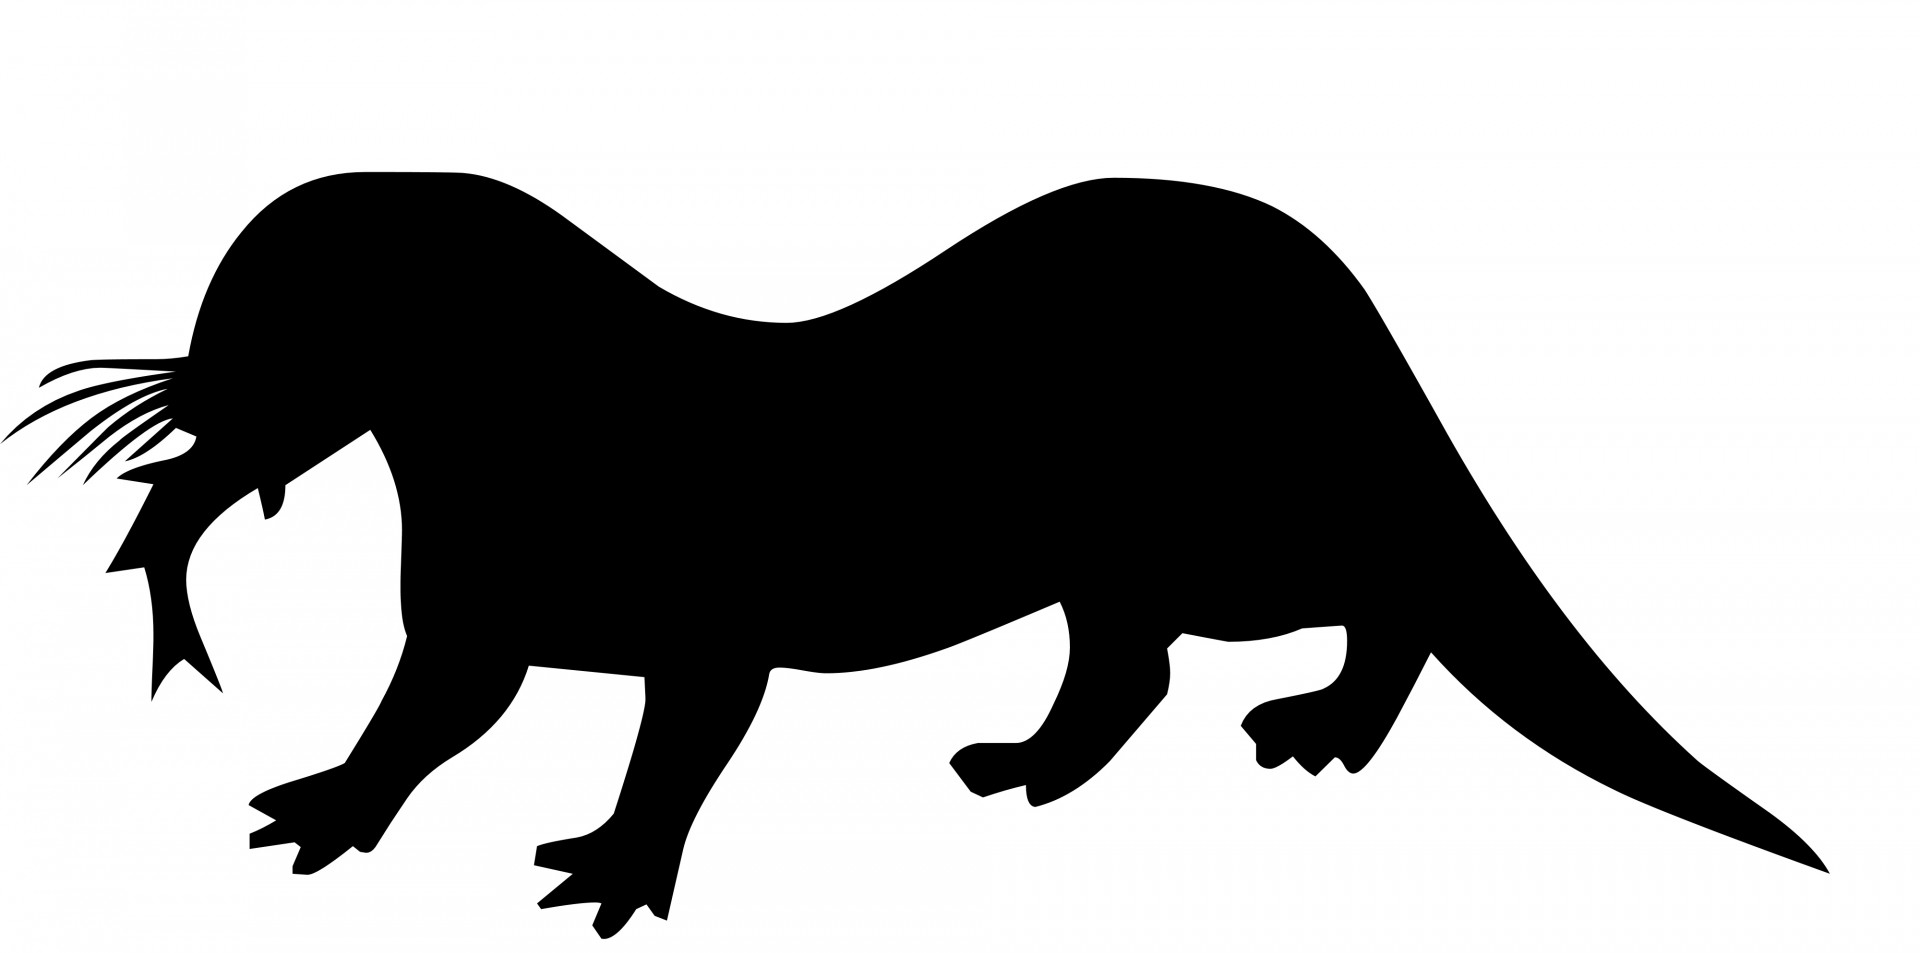 1920x953 Otter Silhouette Free Stock Photo